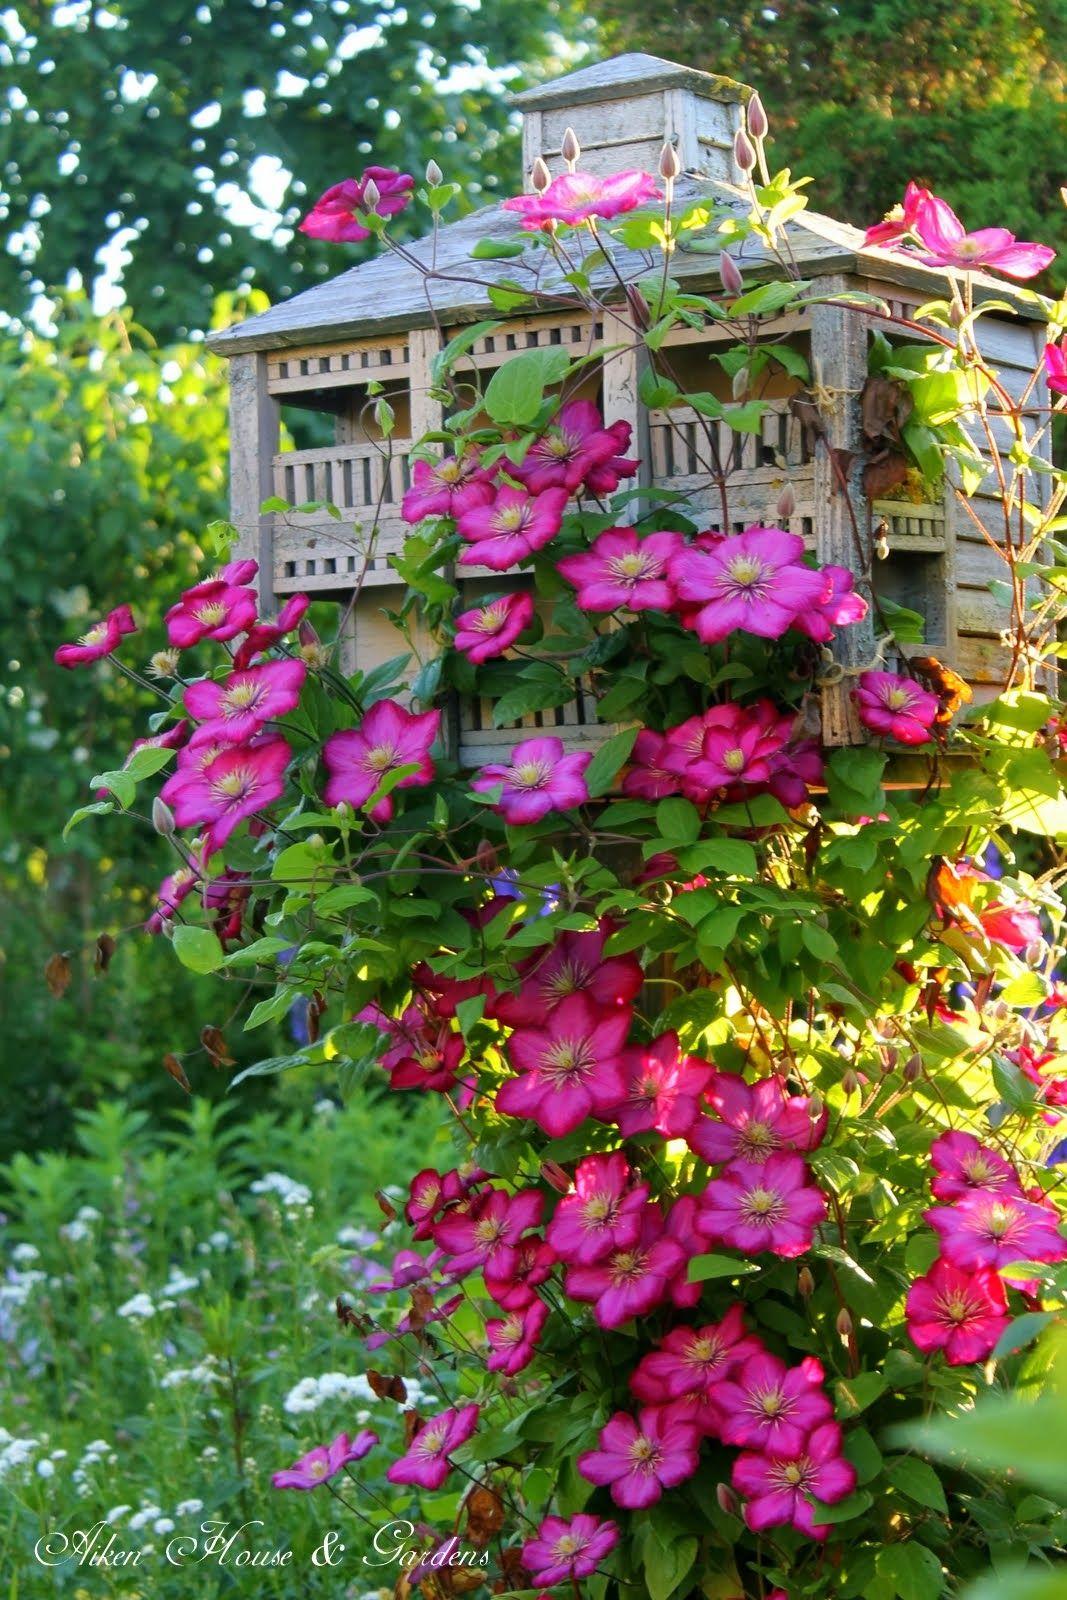 Beautiful House Garden Photo: Ville De Lyon Clematis Growing Up The Birdhouse